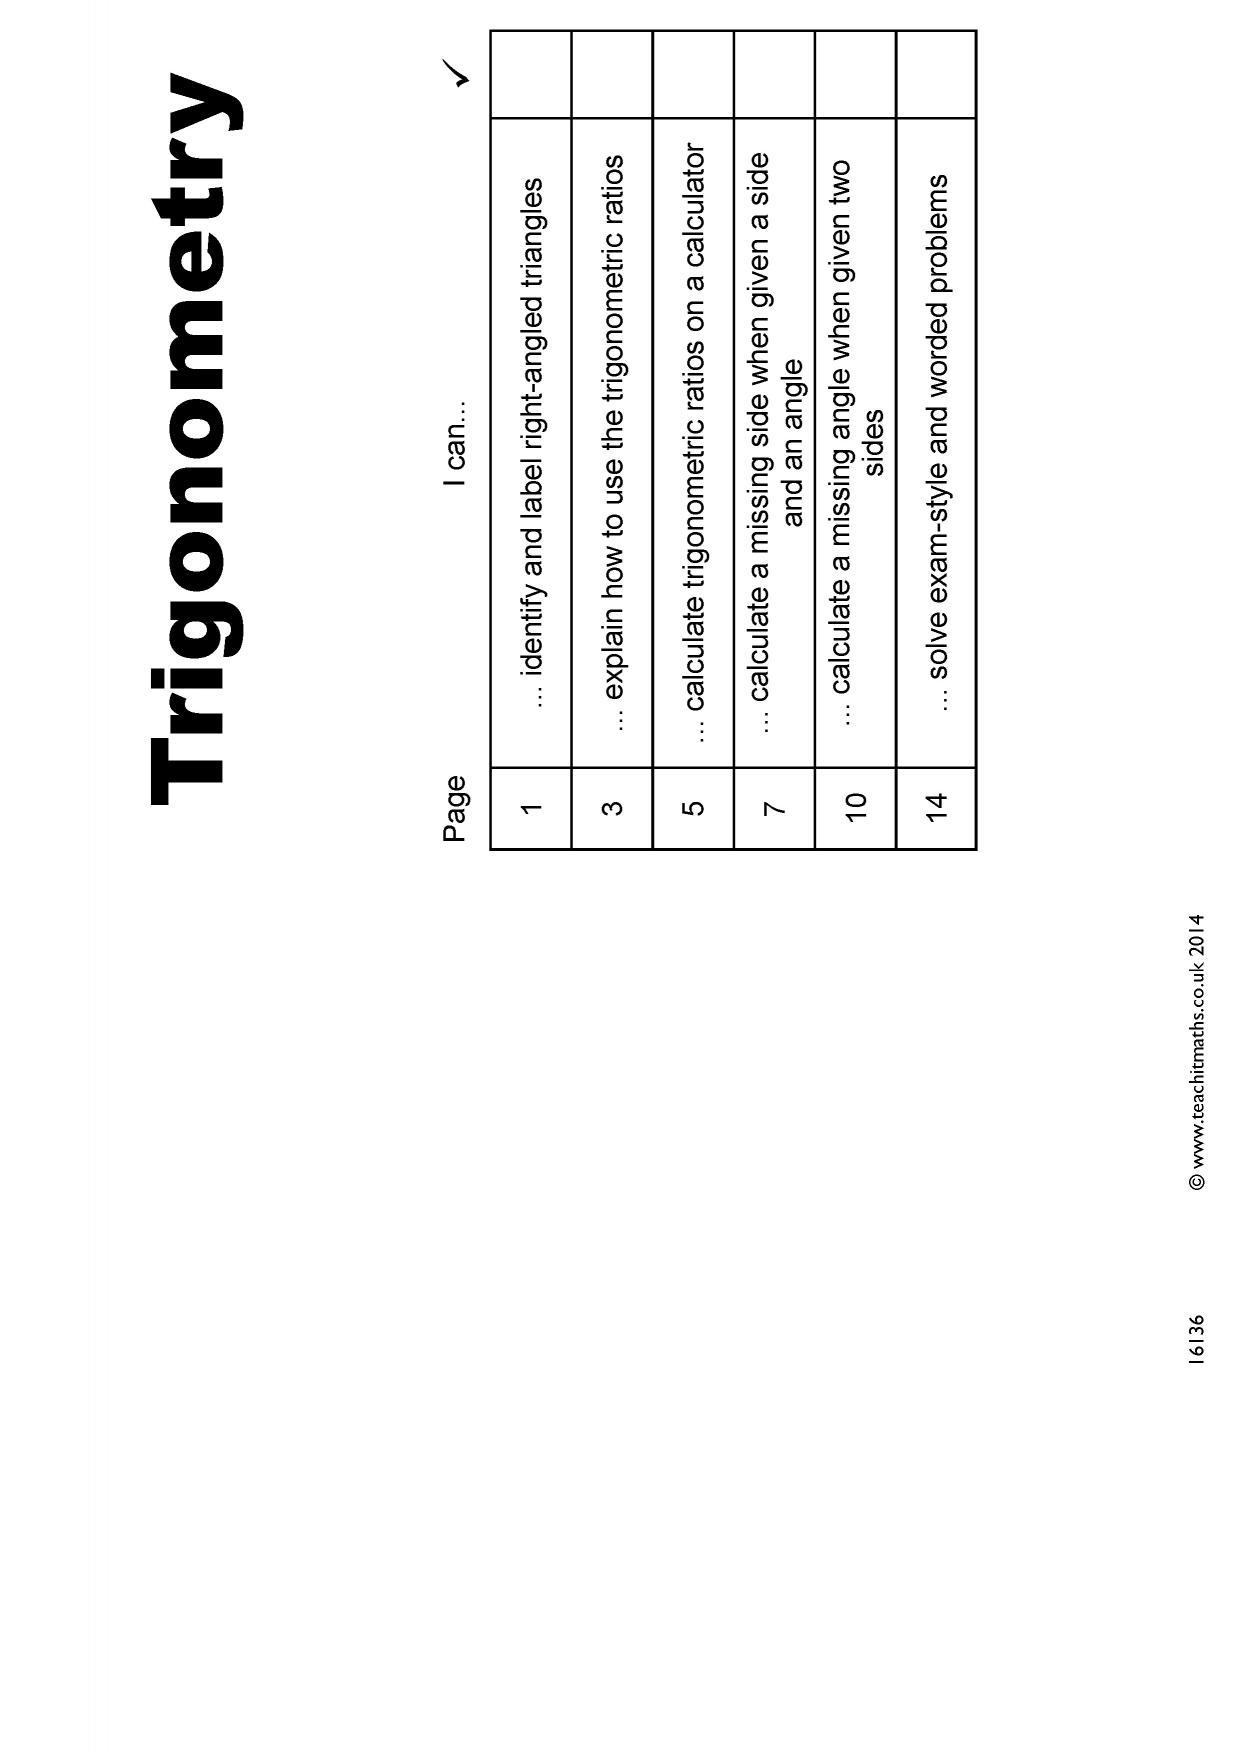 Trigonometry Sohcahtoa